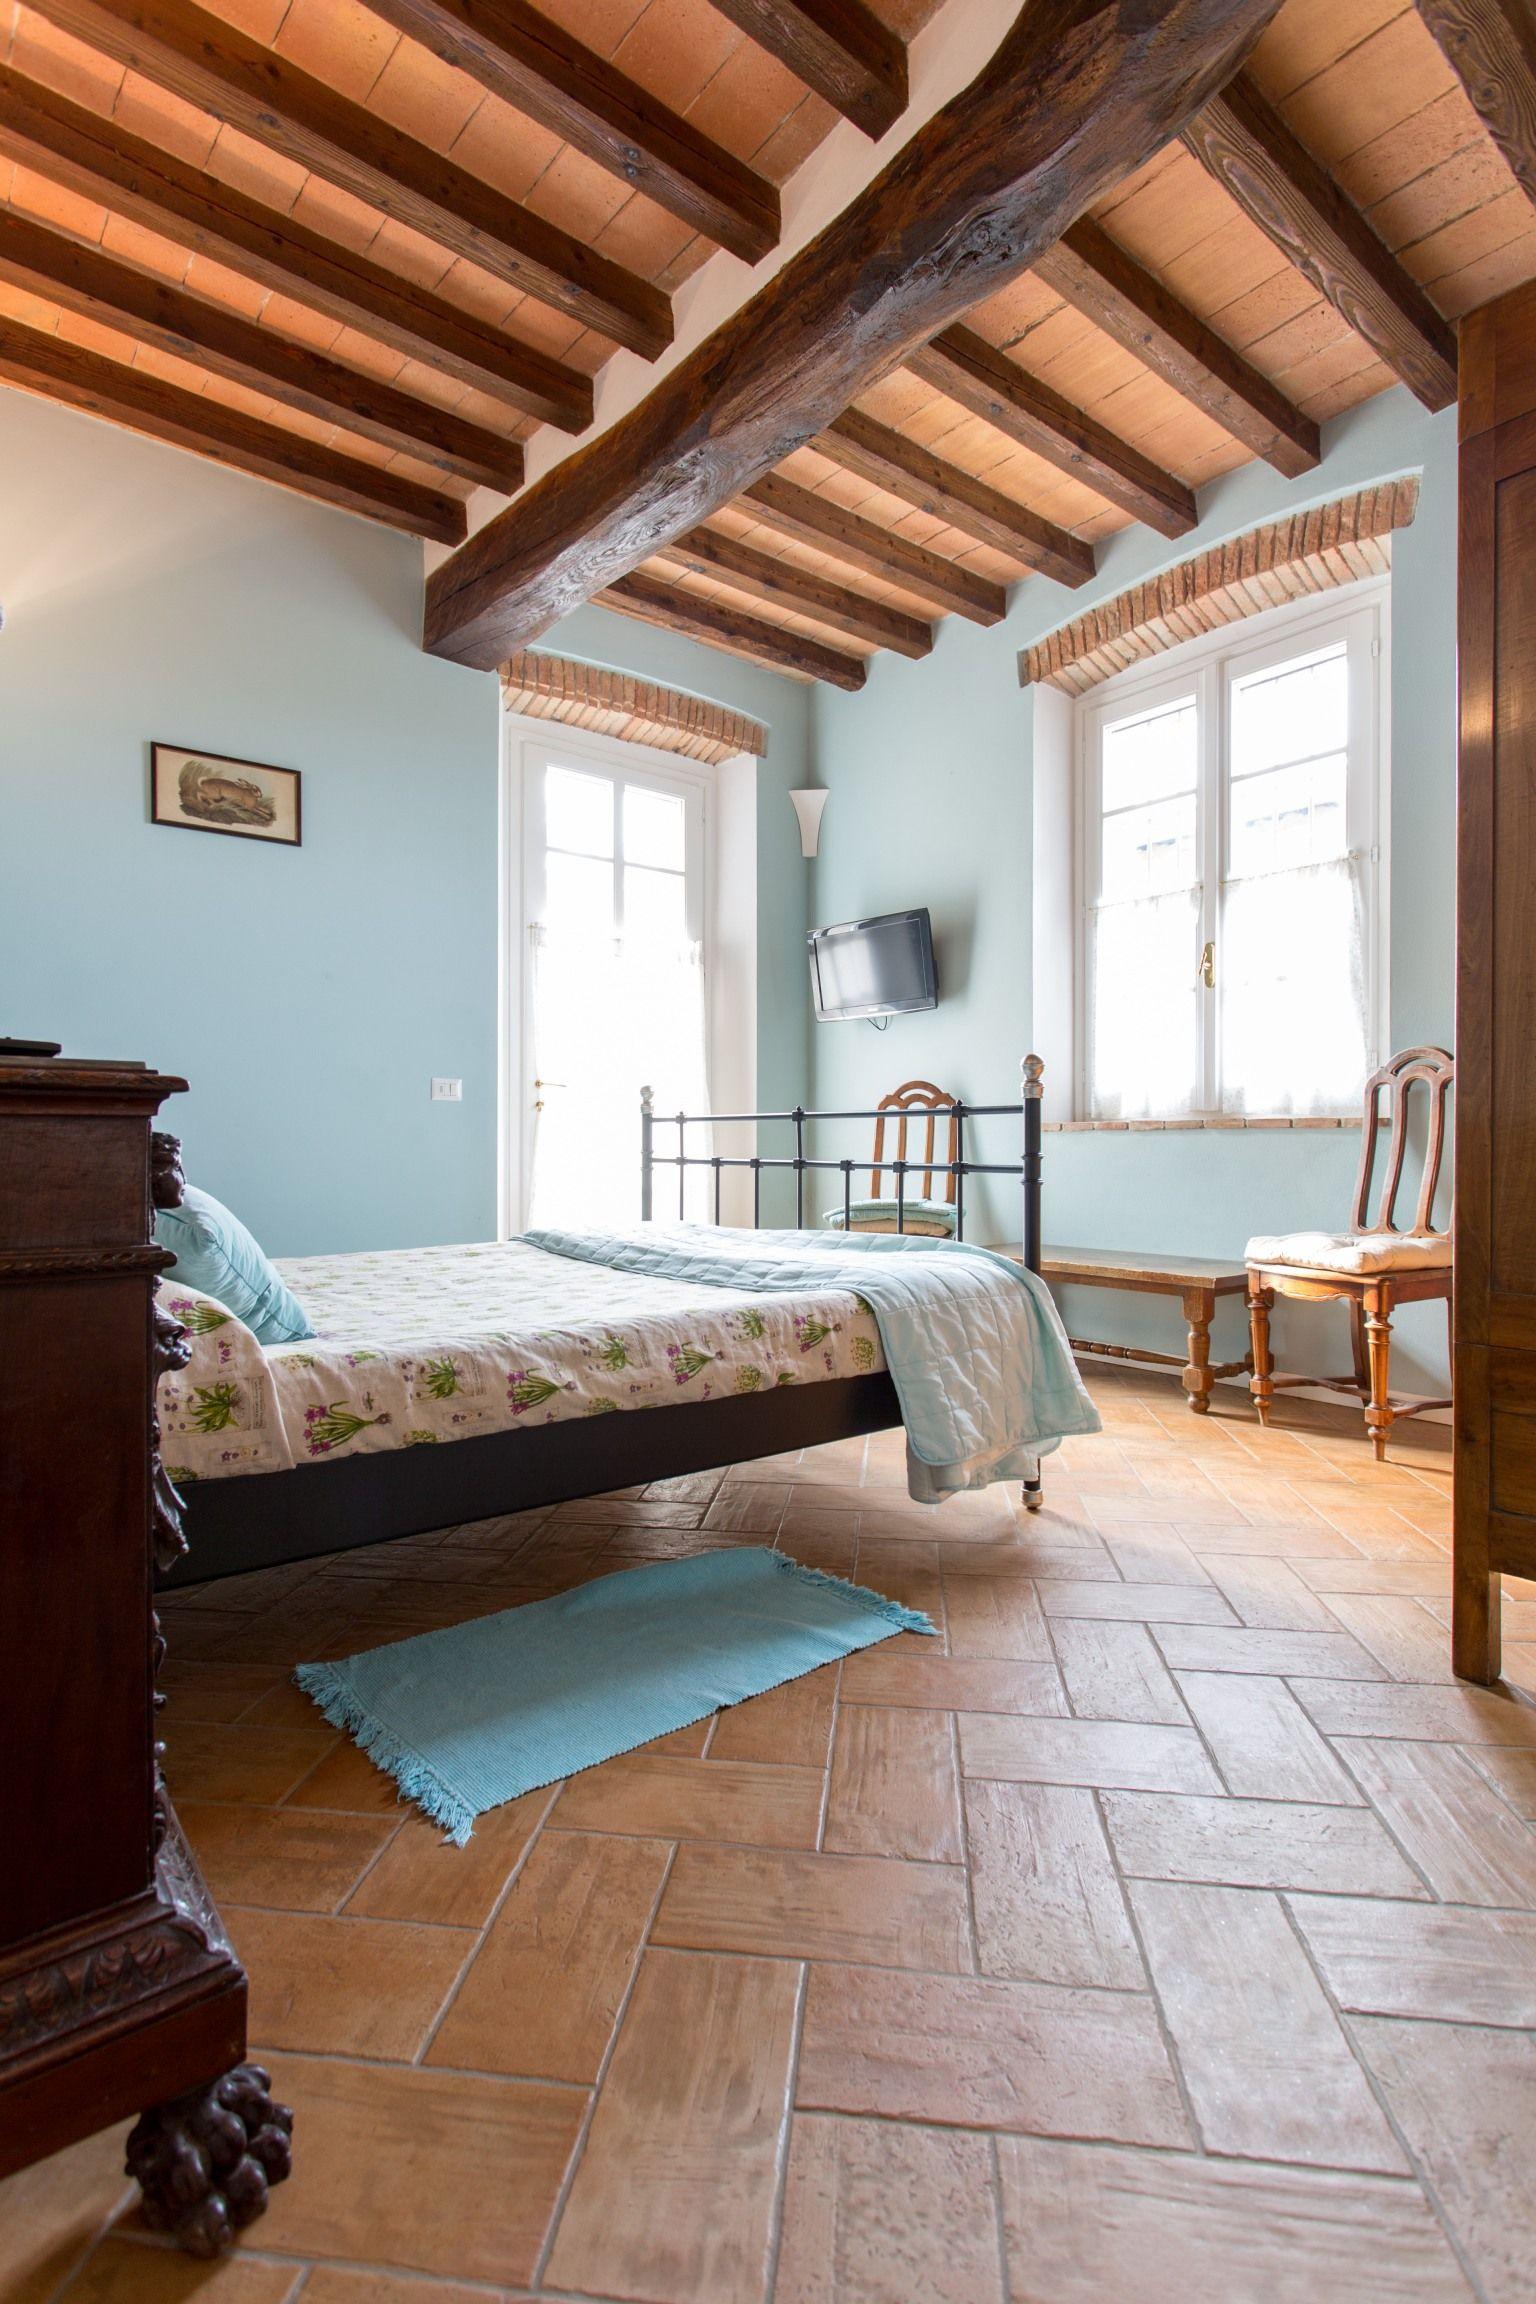 Bed&Breakfast Casa di Arola #parmanelcuoredelgusto #wheretosleep